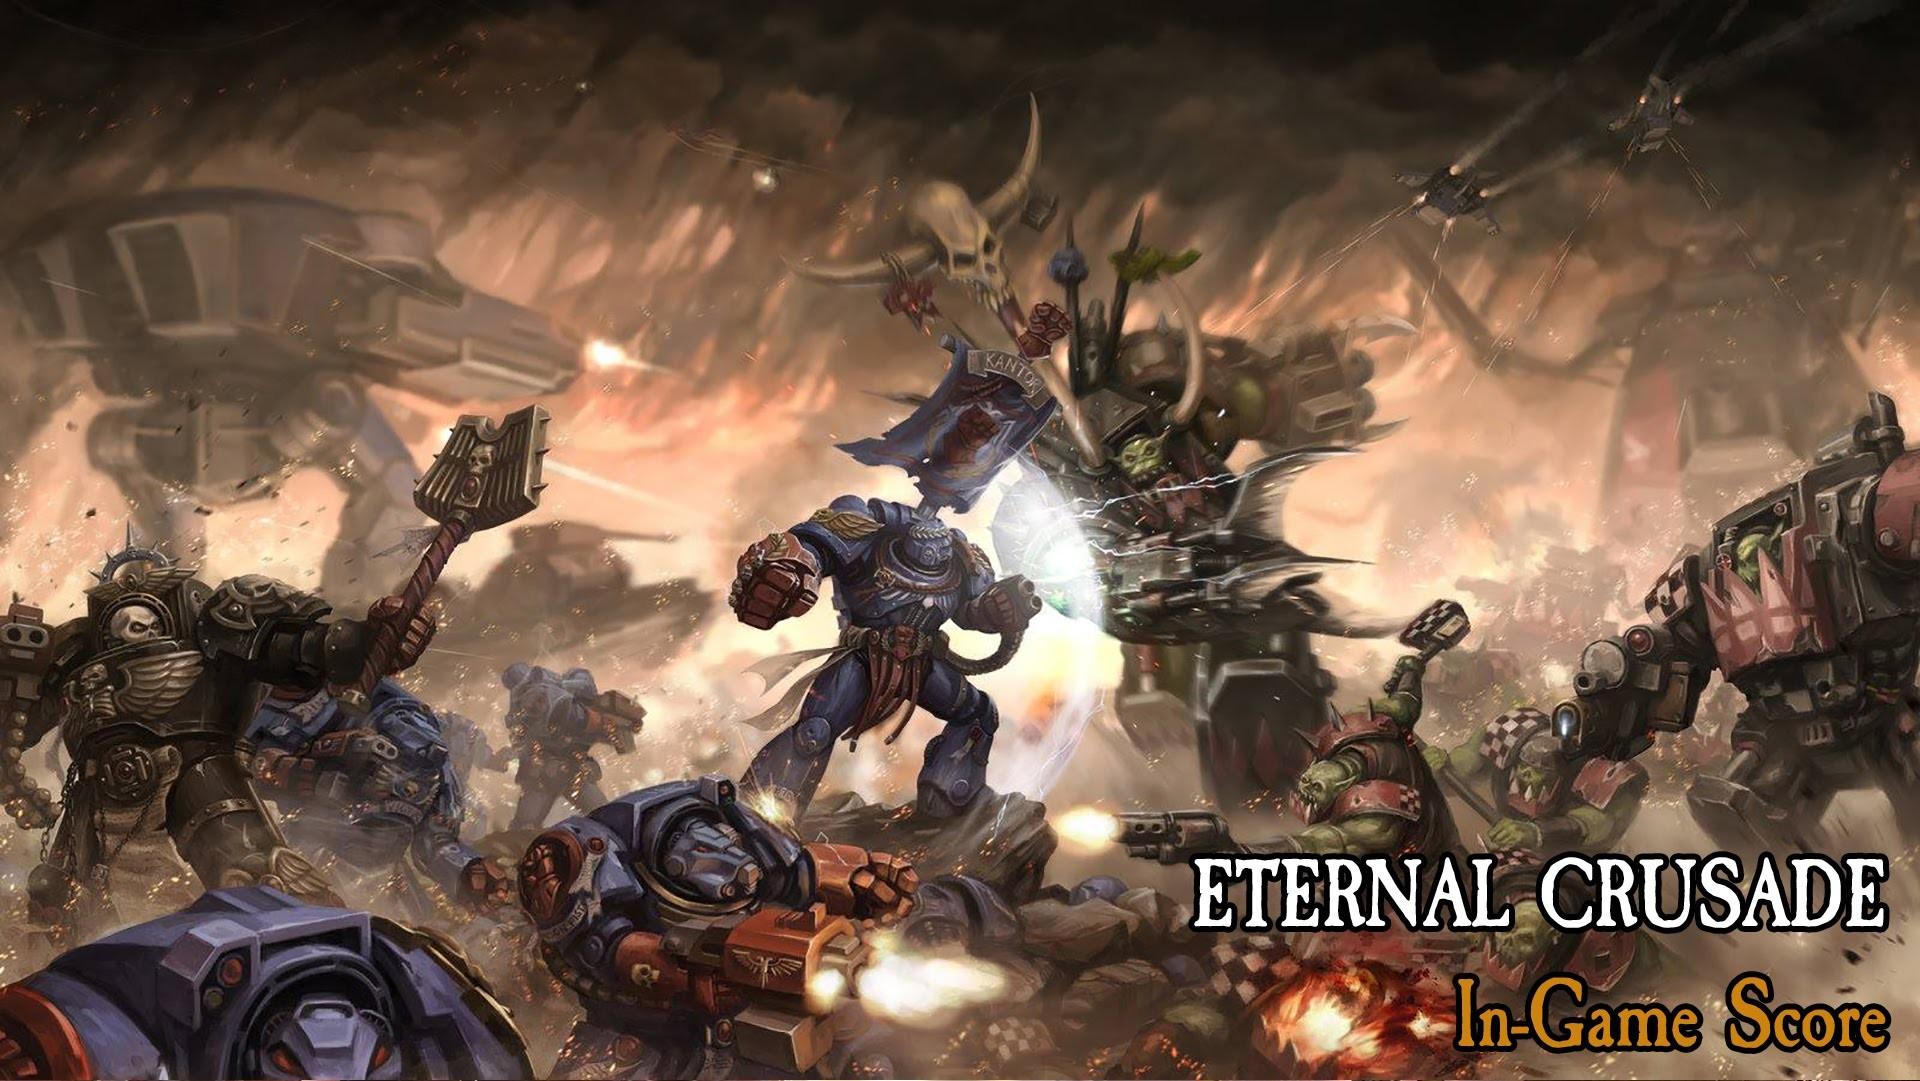 Warhammer 40k Eternal Crusade In-Game Soundtrack #6 – Orks Theme – YouTube